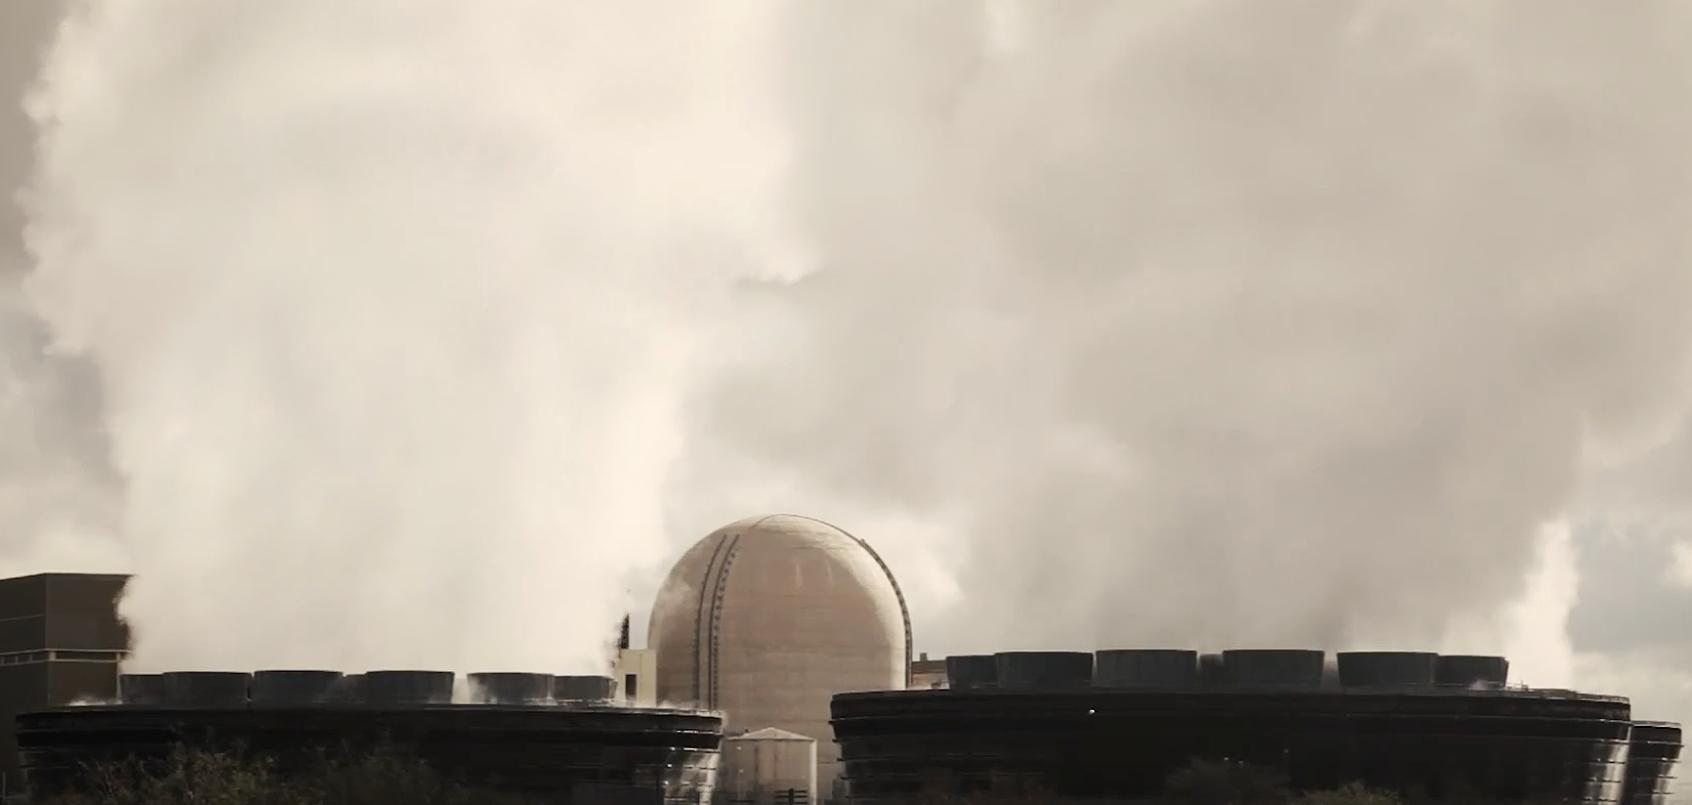 Hilti Nuclear Decommissioning -